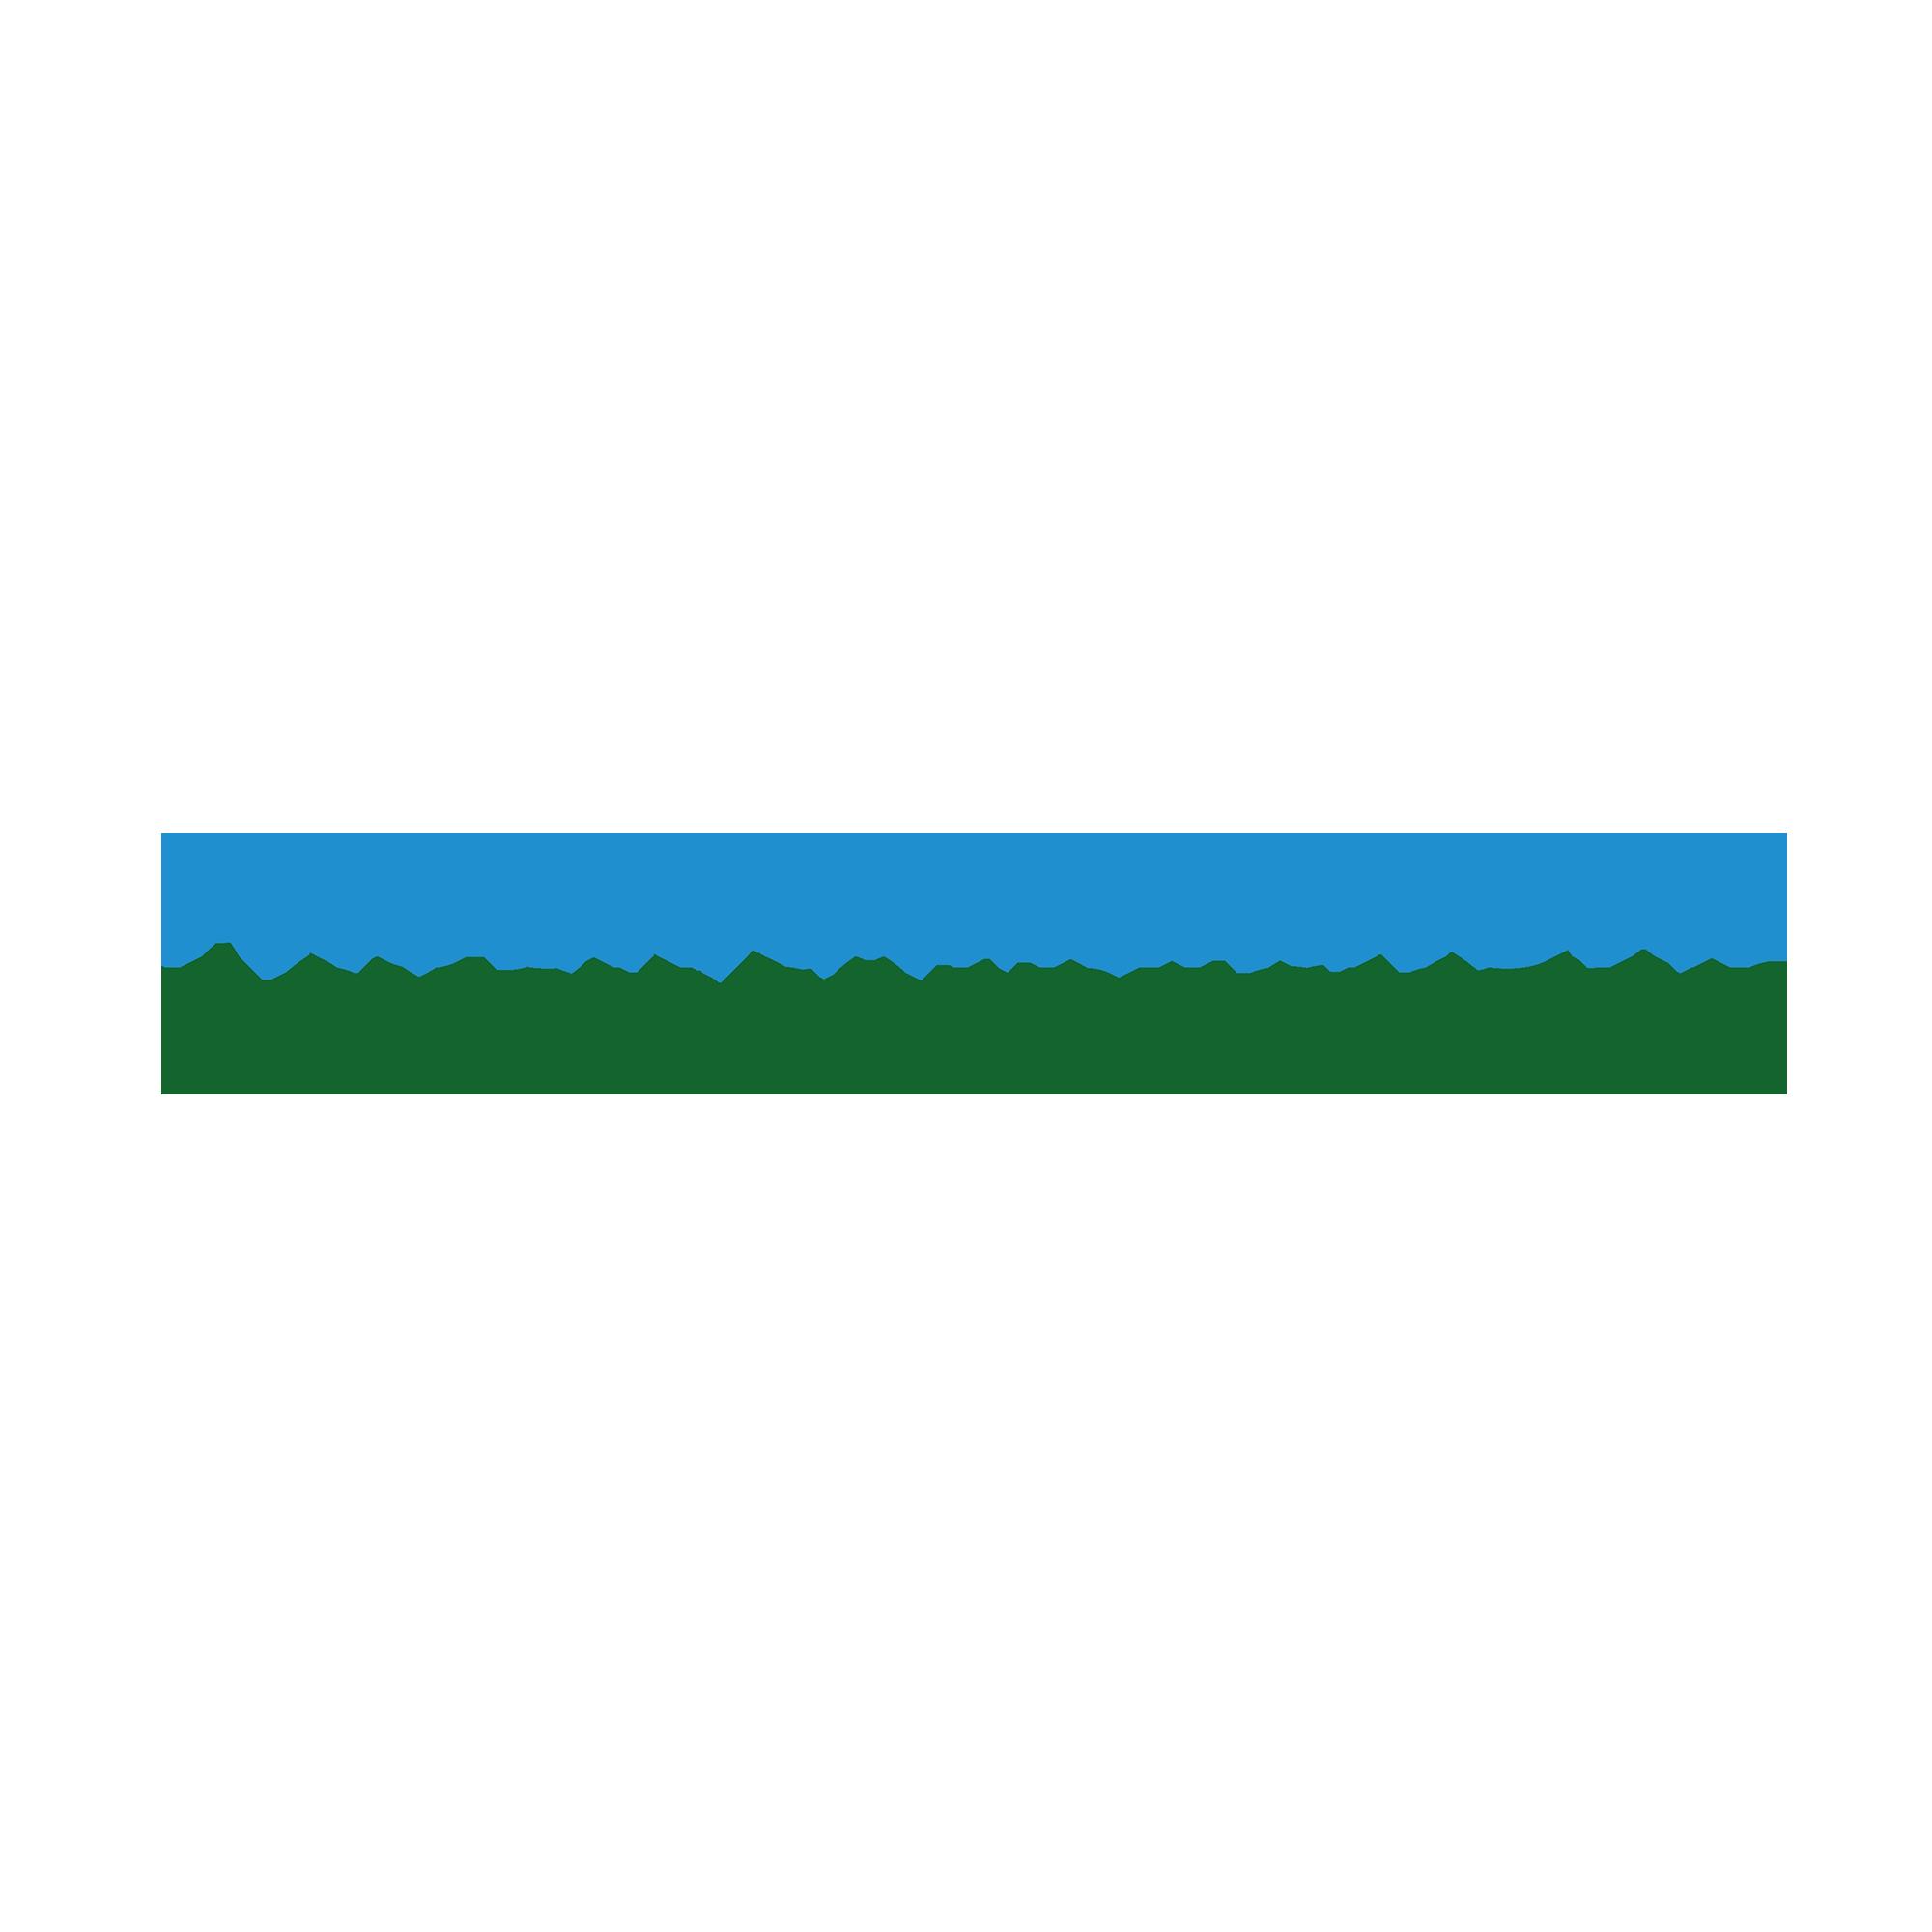 Programmering av RCH kassaregister